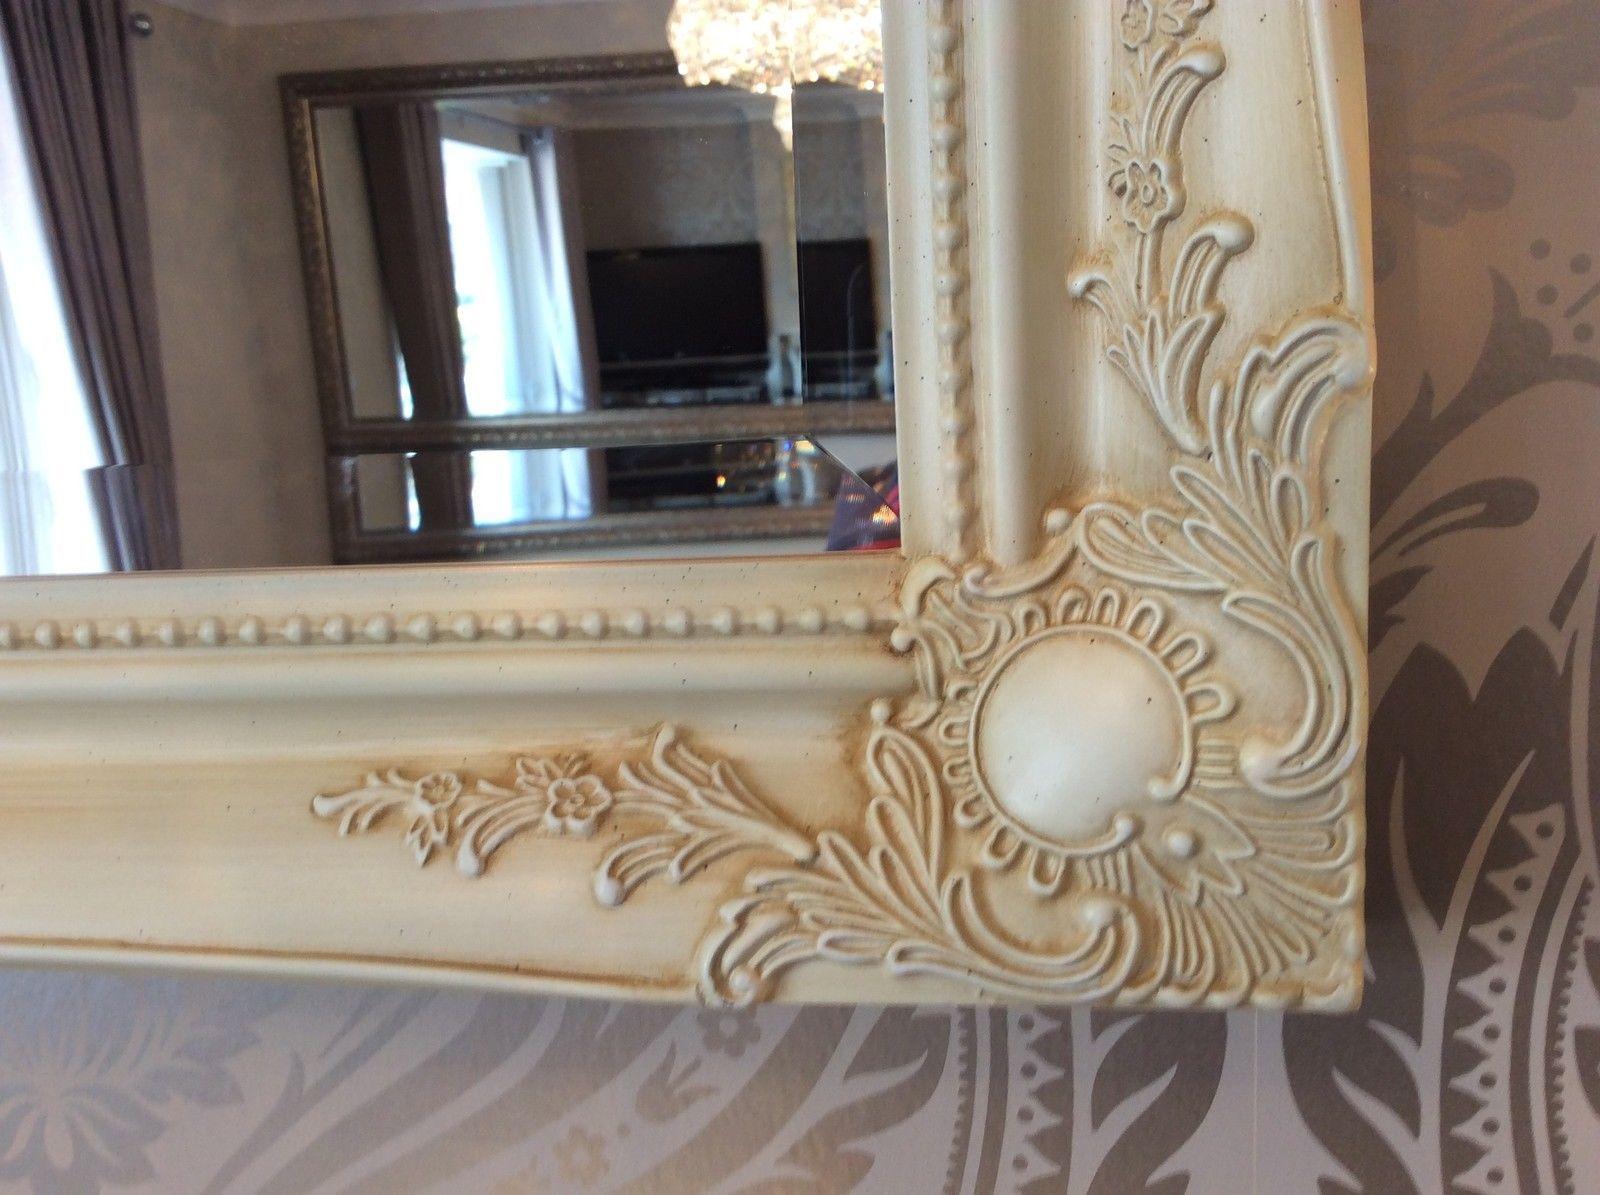 Large Cream Decorative Stunning Shab Chic Wall Mirror Free Pp Regarding Shabby Chic Cream Mirror (Image 2 of 15)